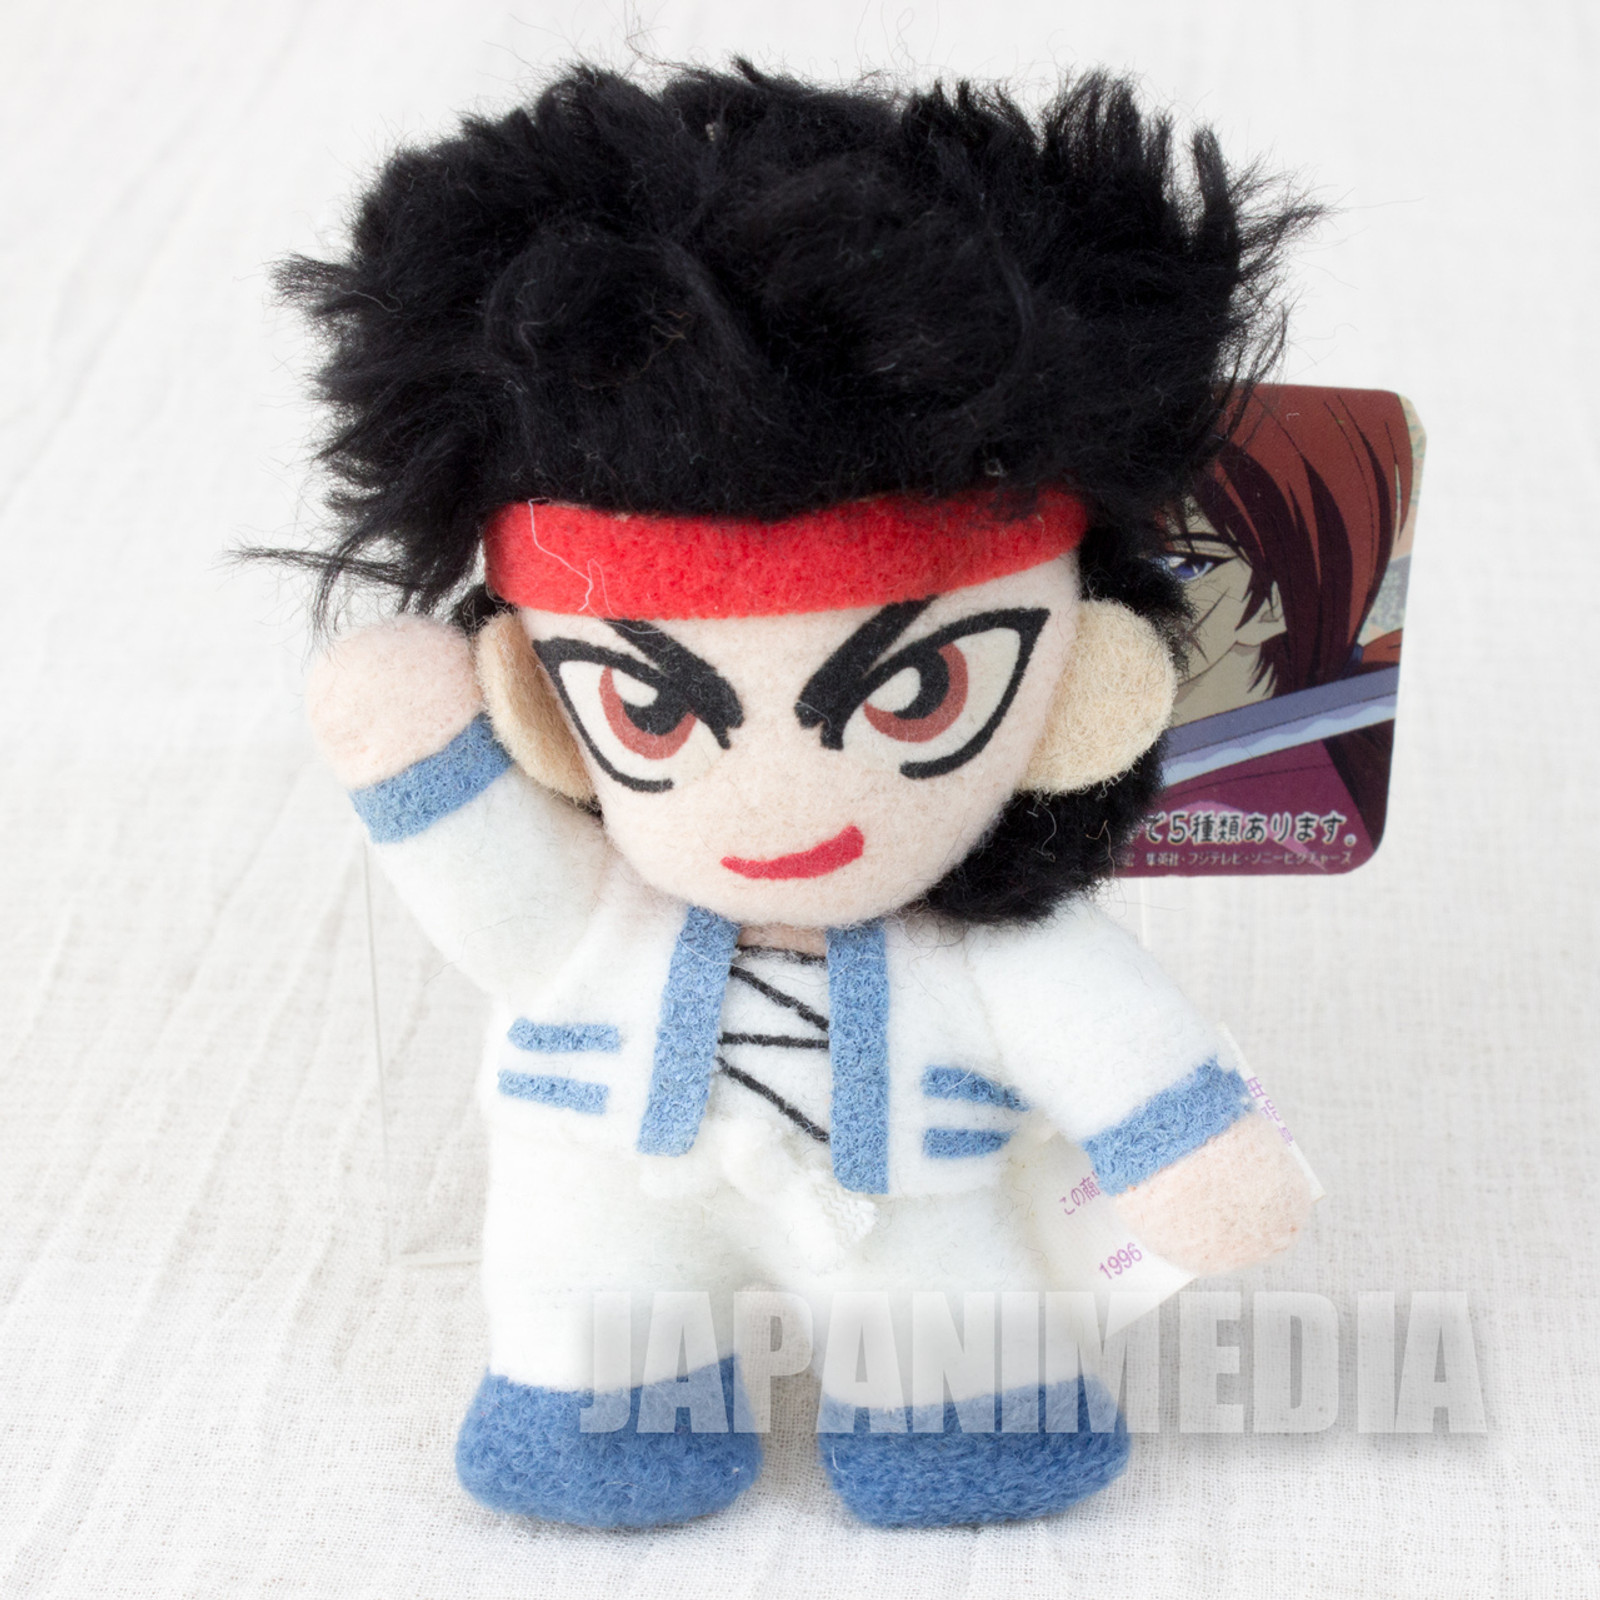 Rurouni Kenshin Sanosuke Sagara Plush Doll Keychain JAPAN ANIME MANGA